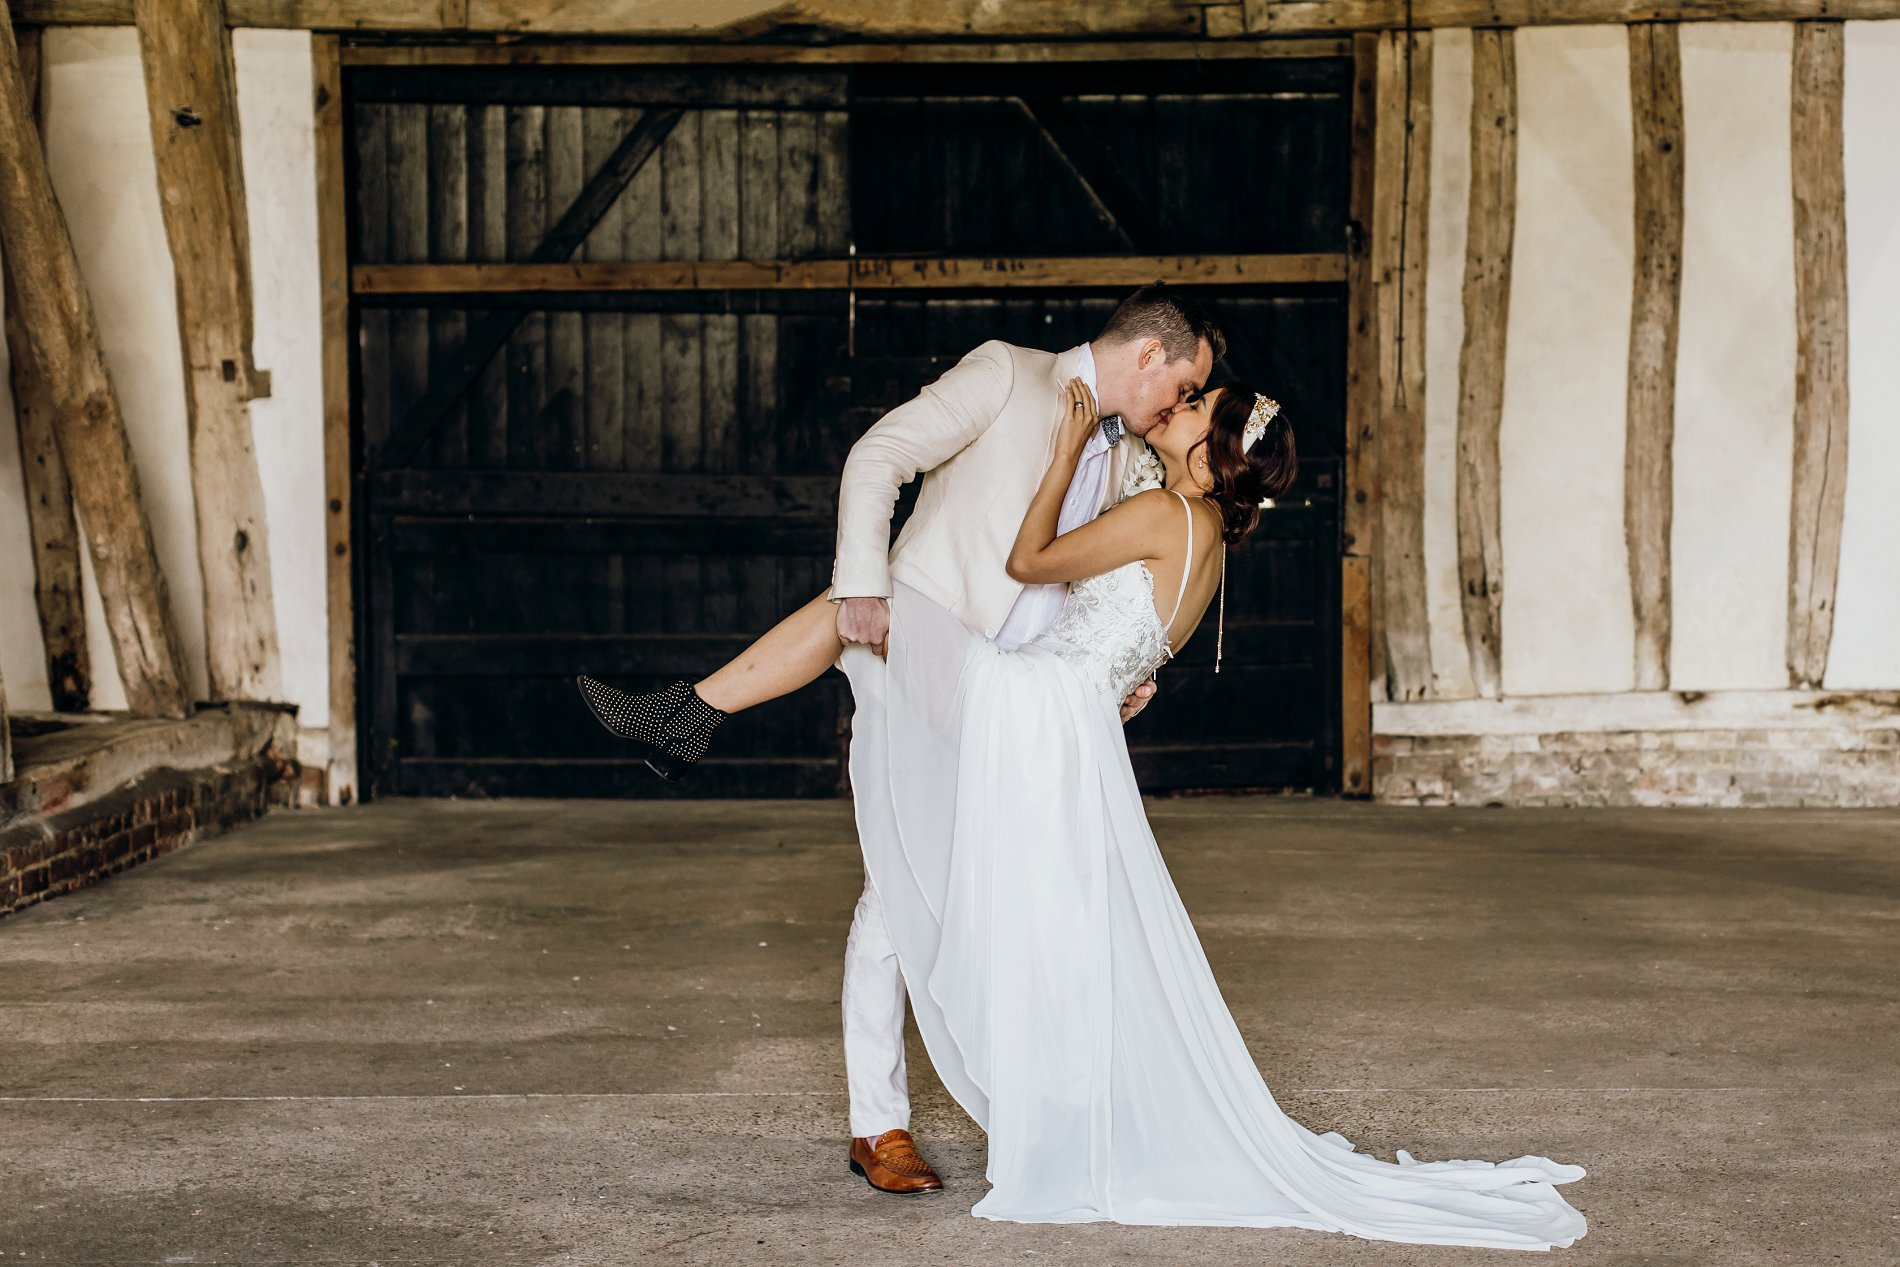 A Golden Boho Wedding Shoot at Cressing Temple Barns (c) Kate Boston Photography (29)